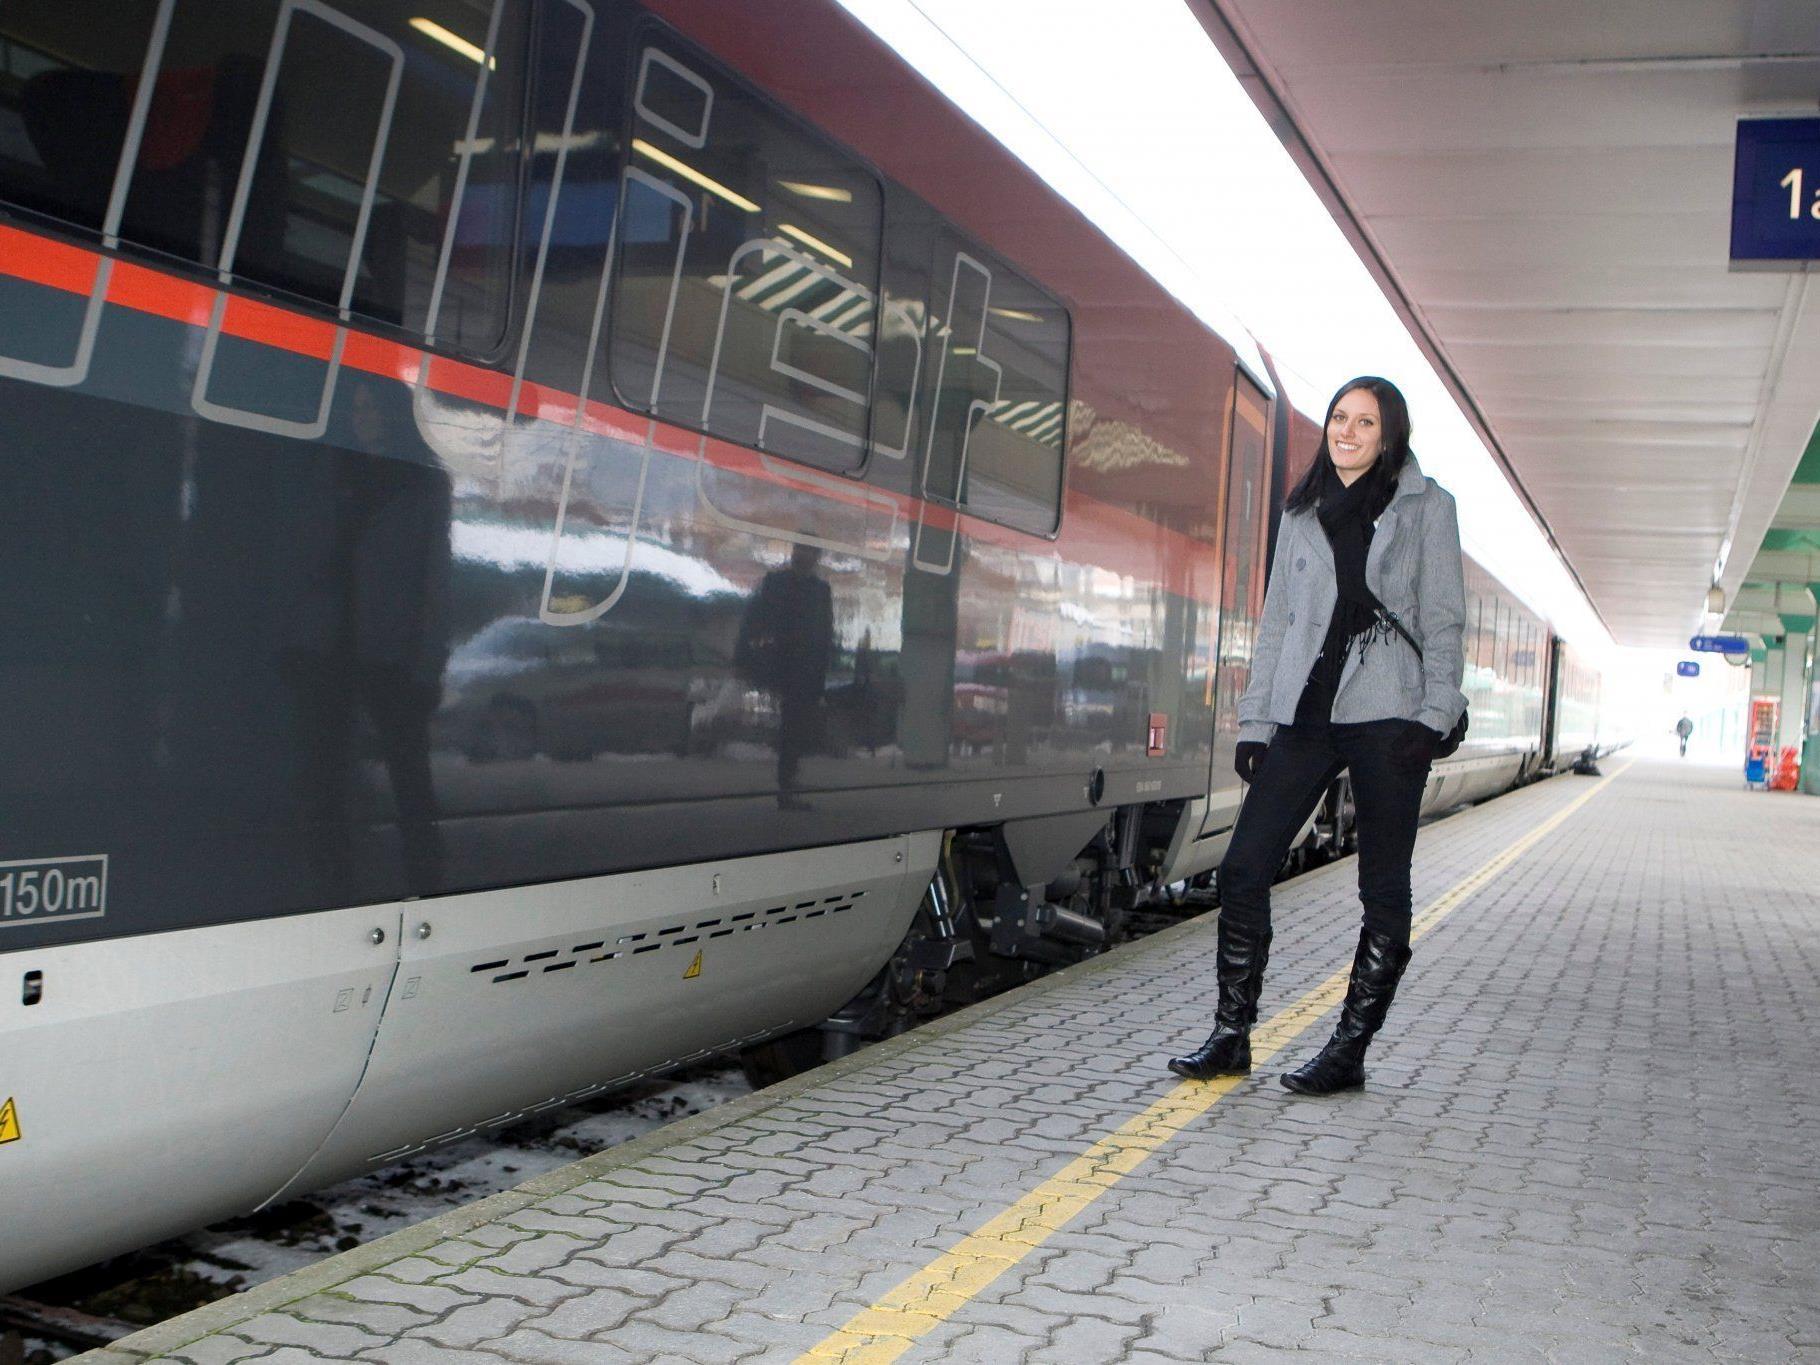 Verkehrsclub Lobt Bahn Angebot In Vorarlberg Vorarlberg